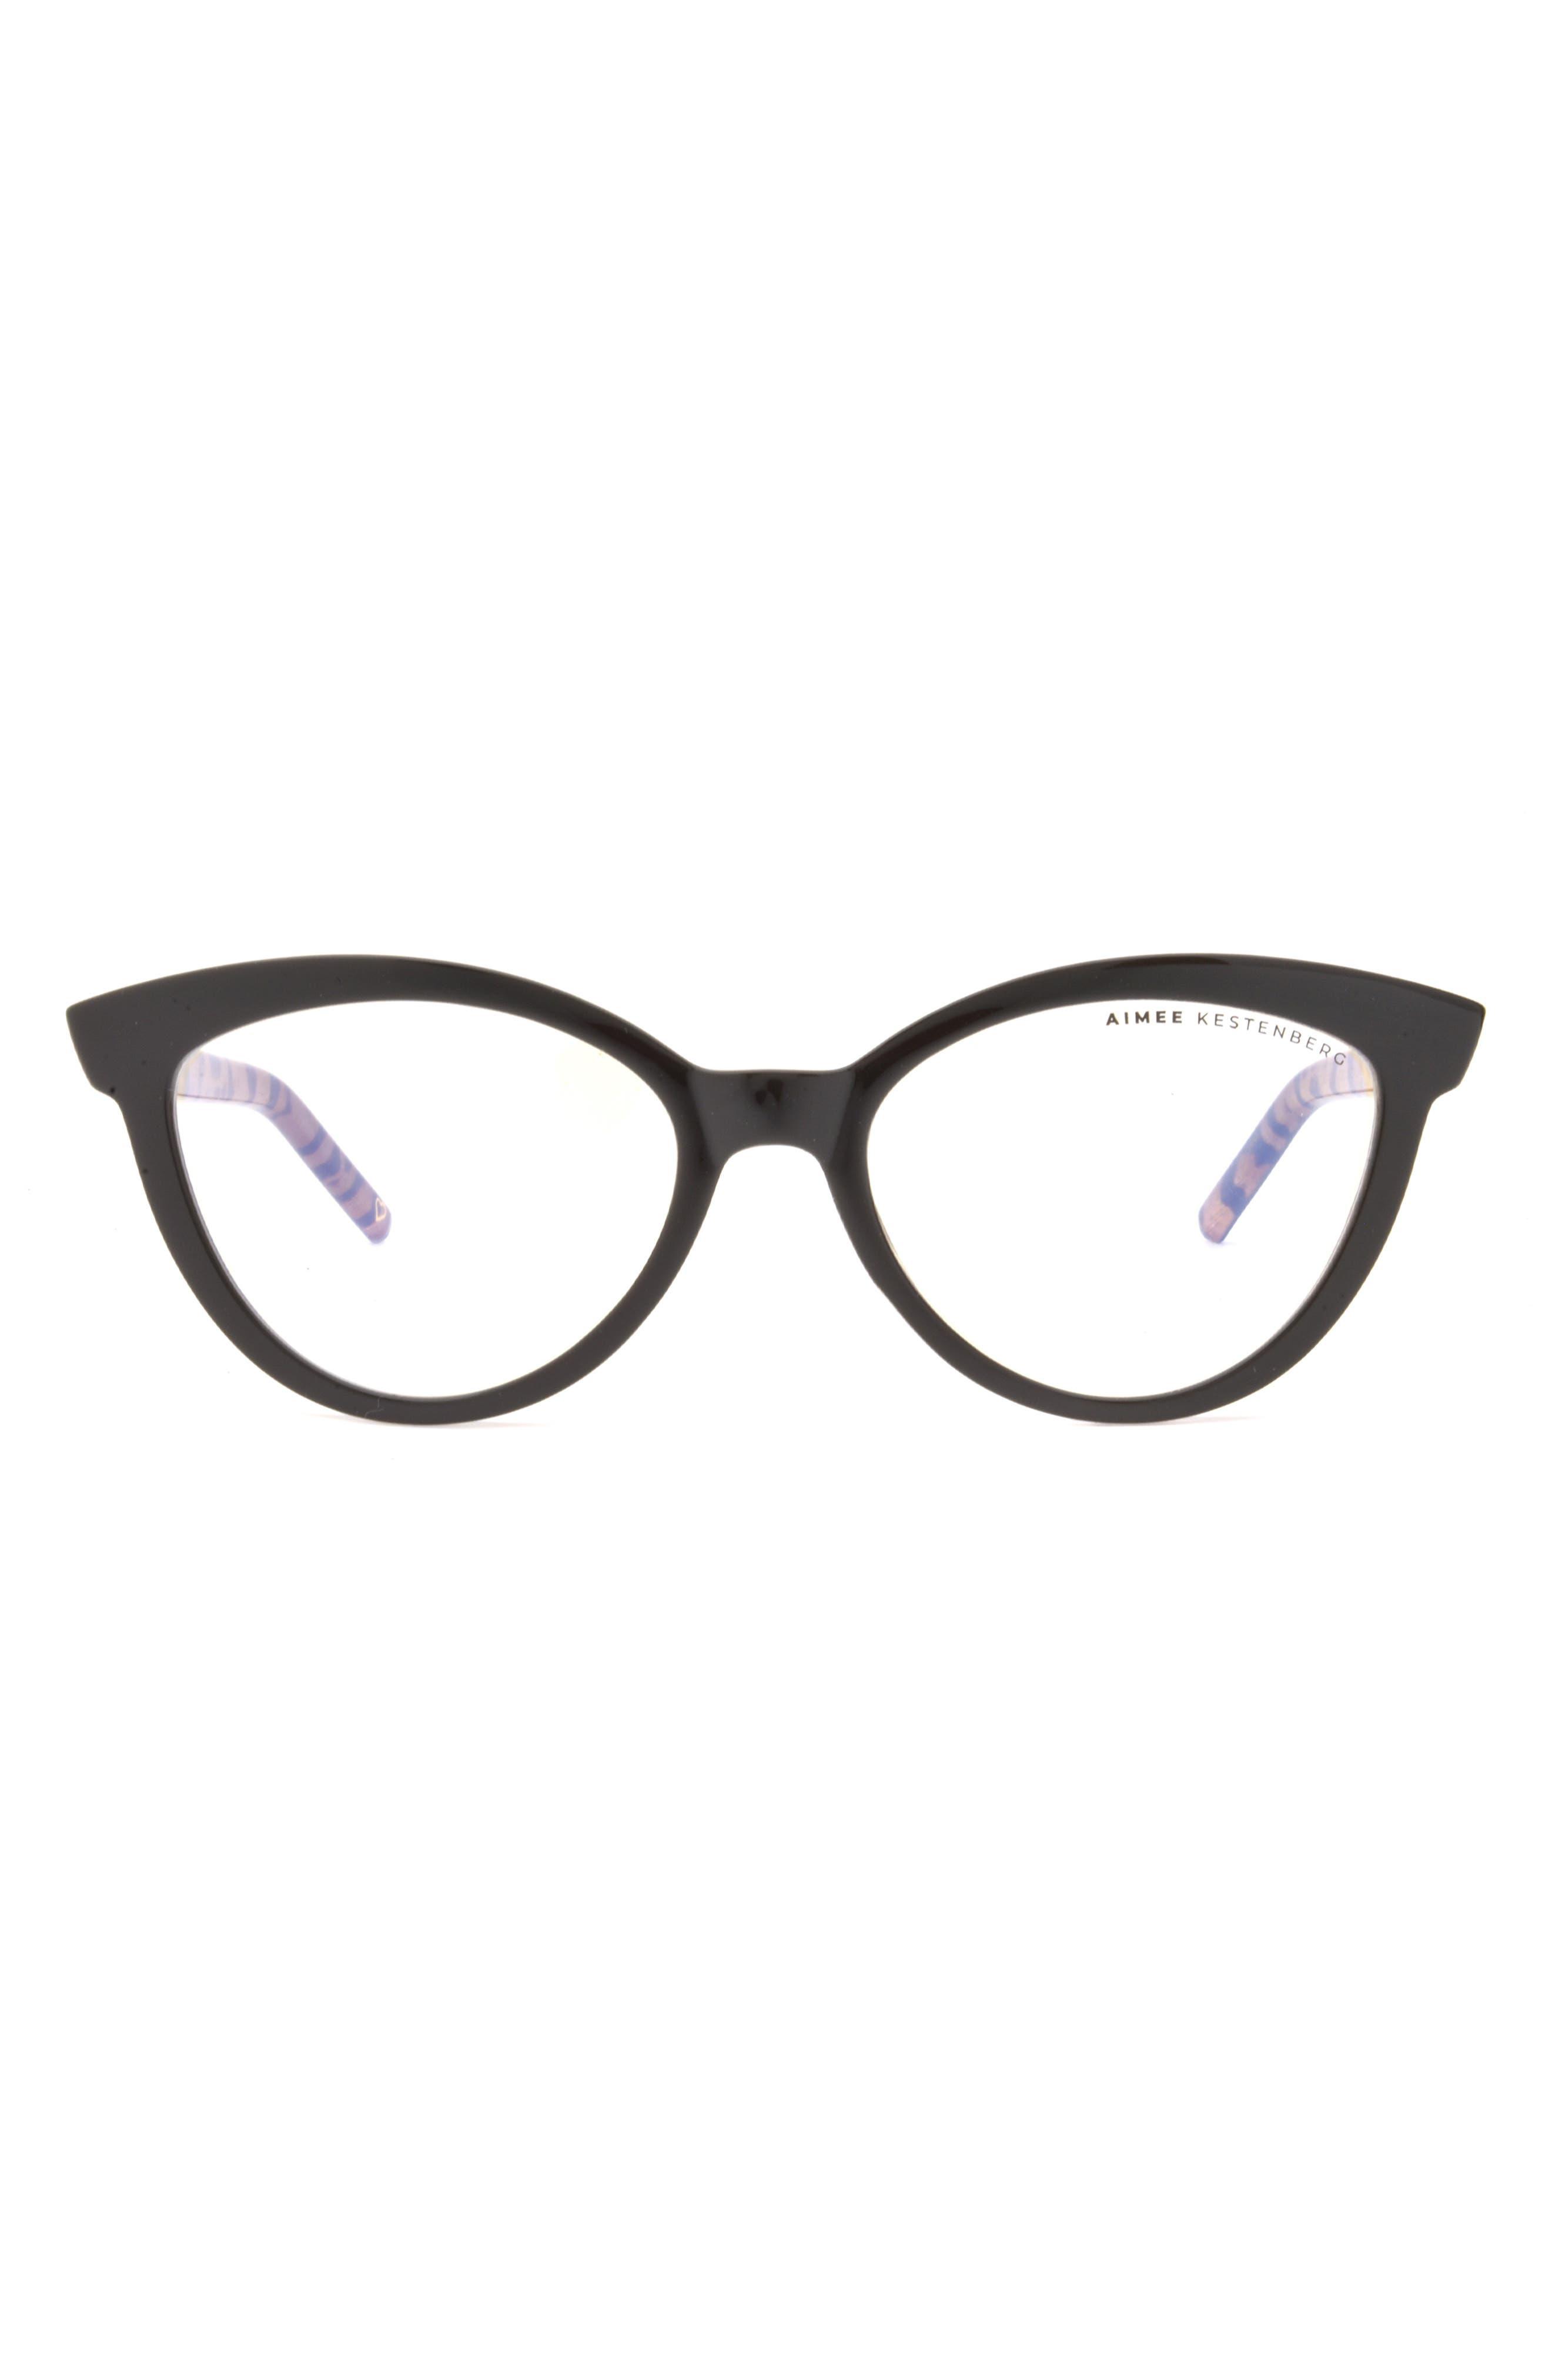 Madison 50mm Cat Eye Blue Light Blocking Glasses